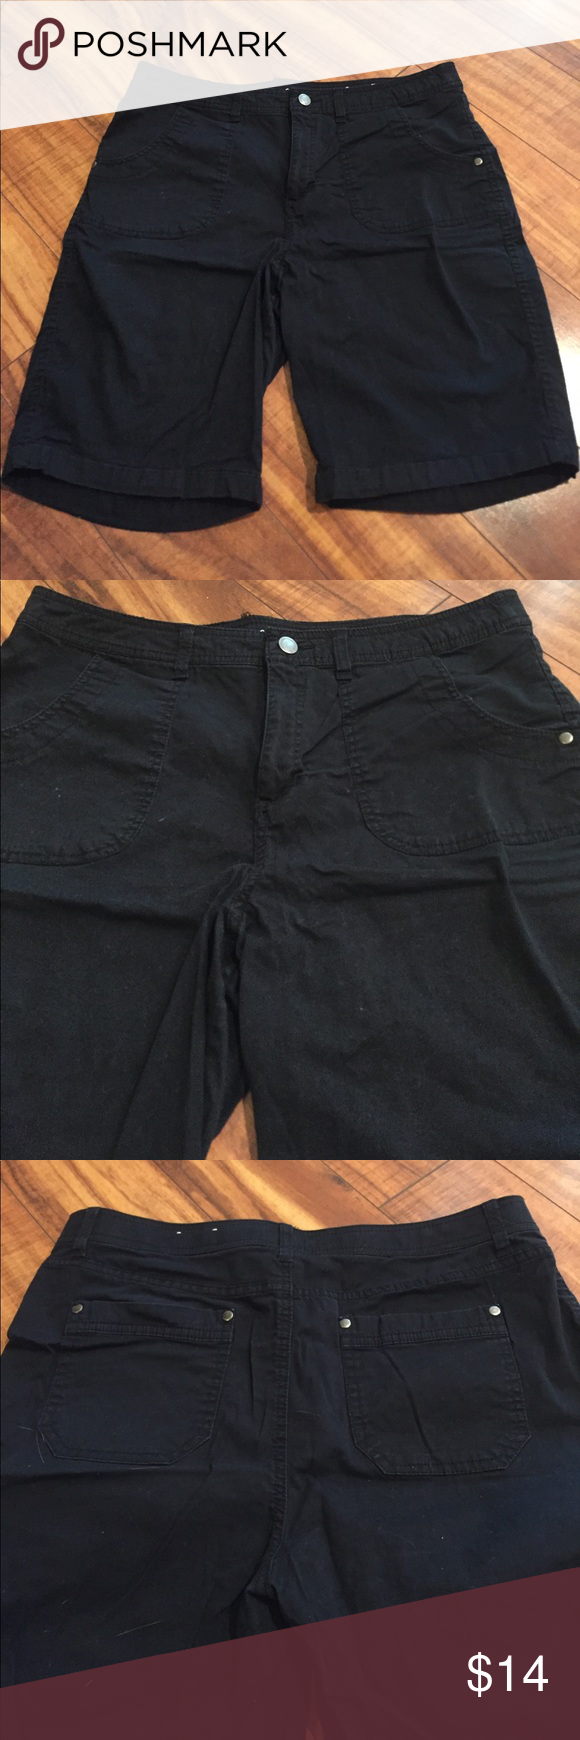 Croft u Barrow Black shorts size  Like new croft and barrow black